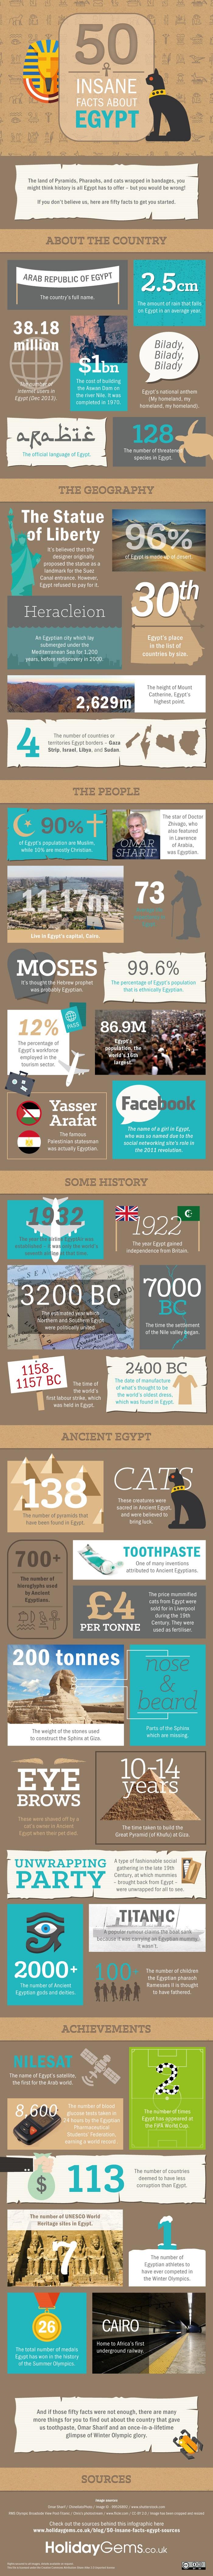 50 Insane Facts Egypt